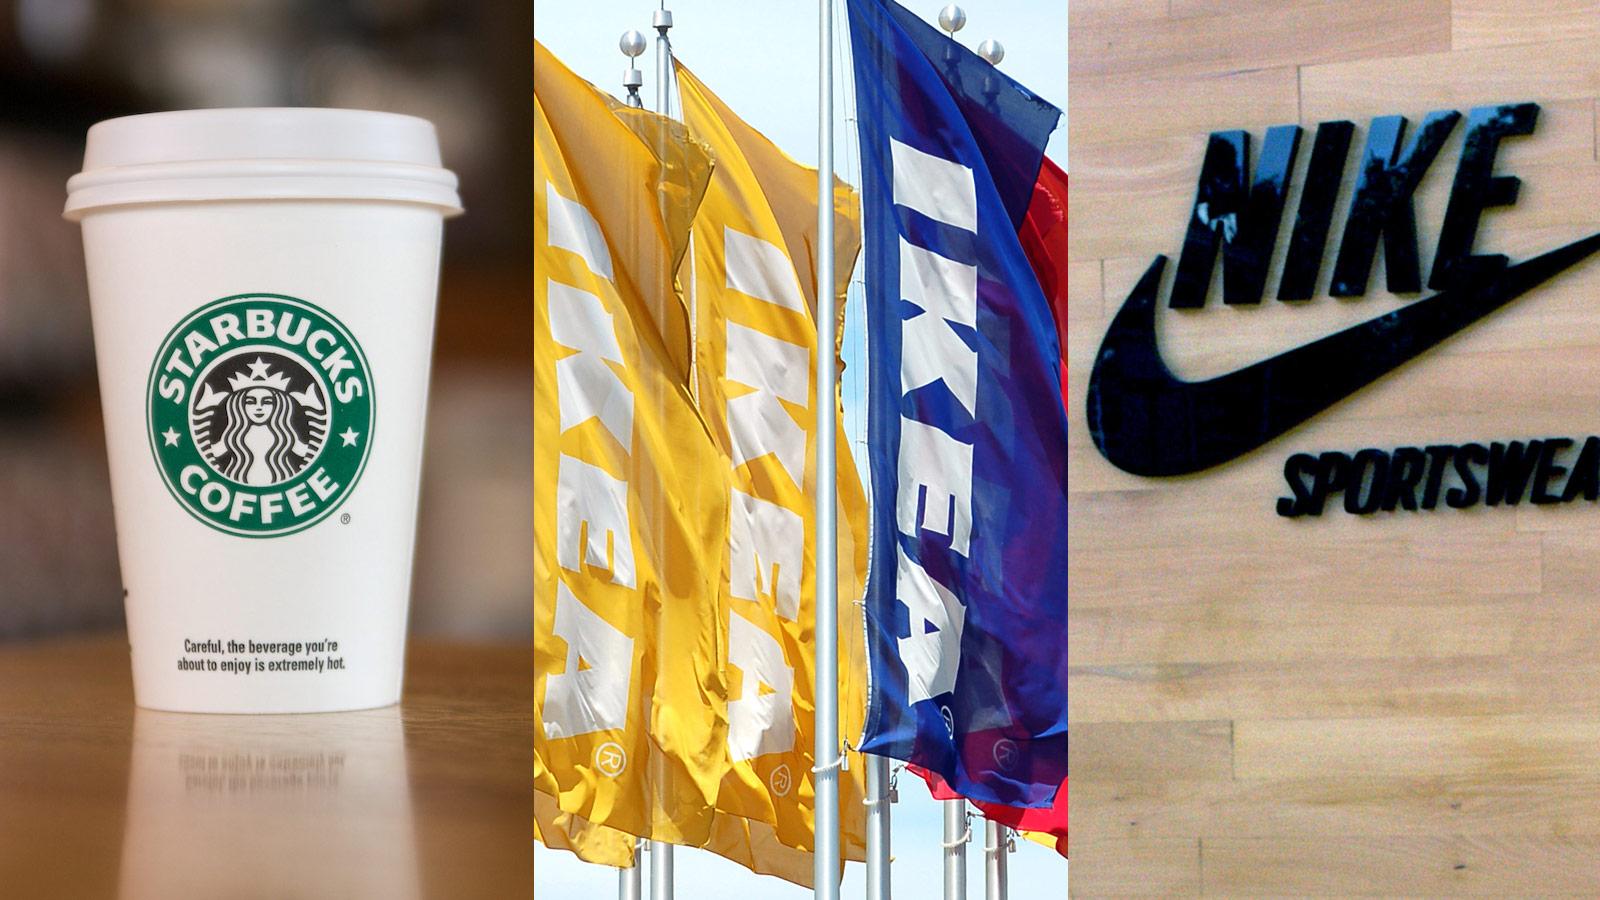 Starbucks, Ikea, Nike